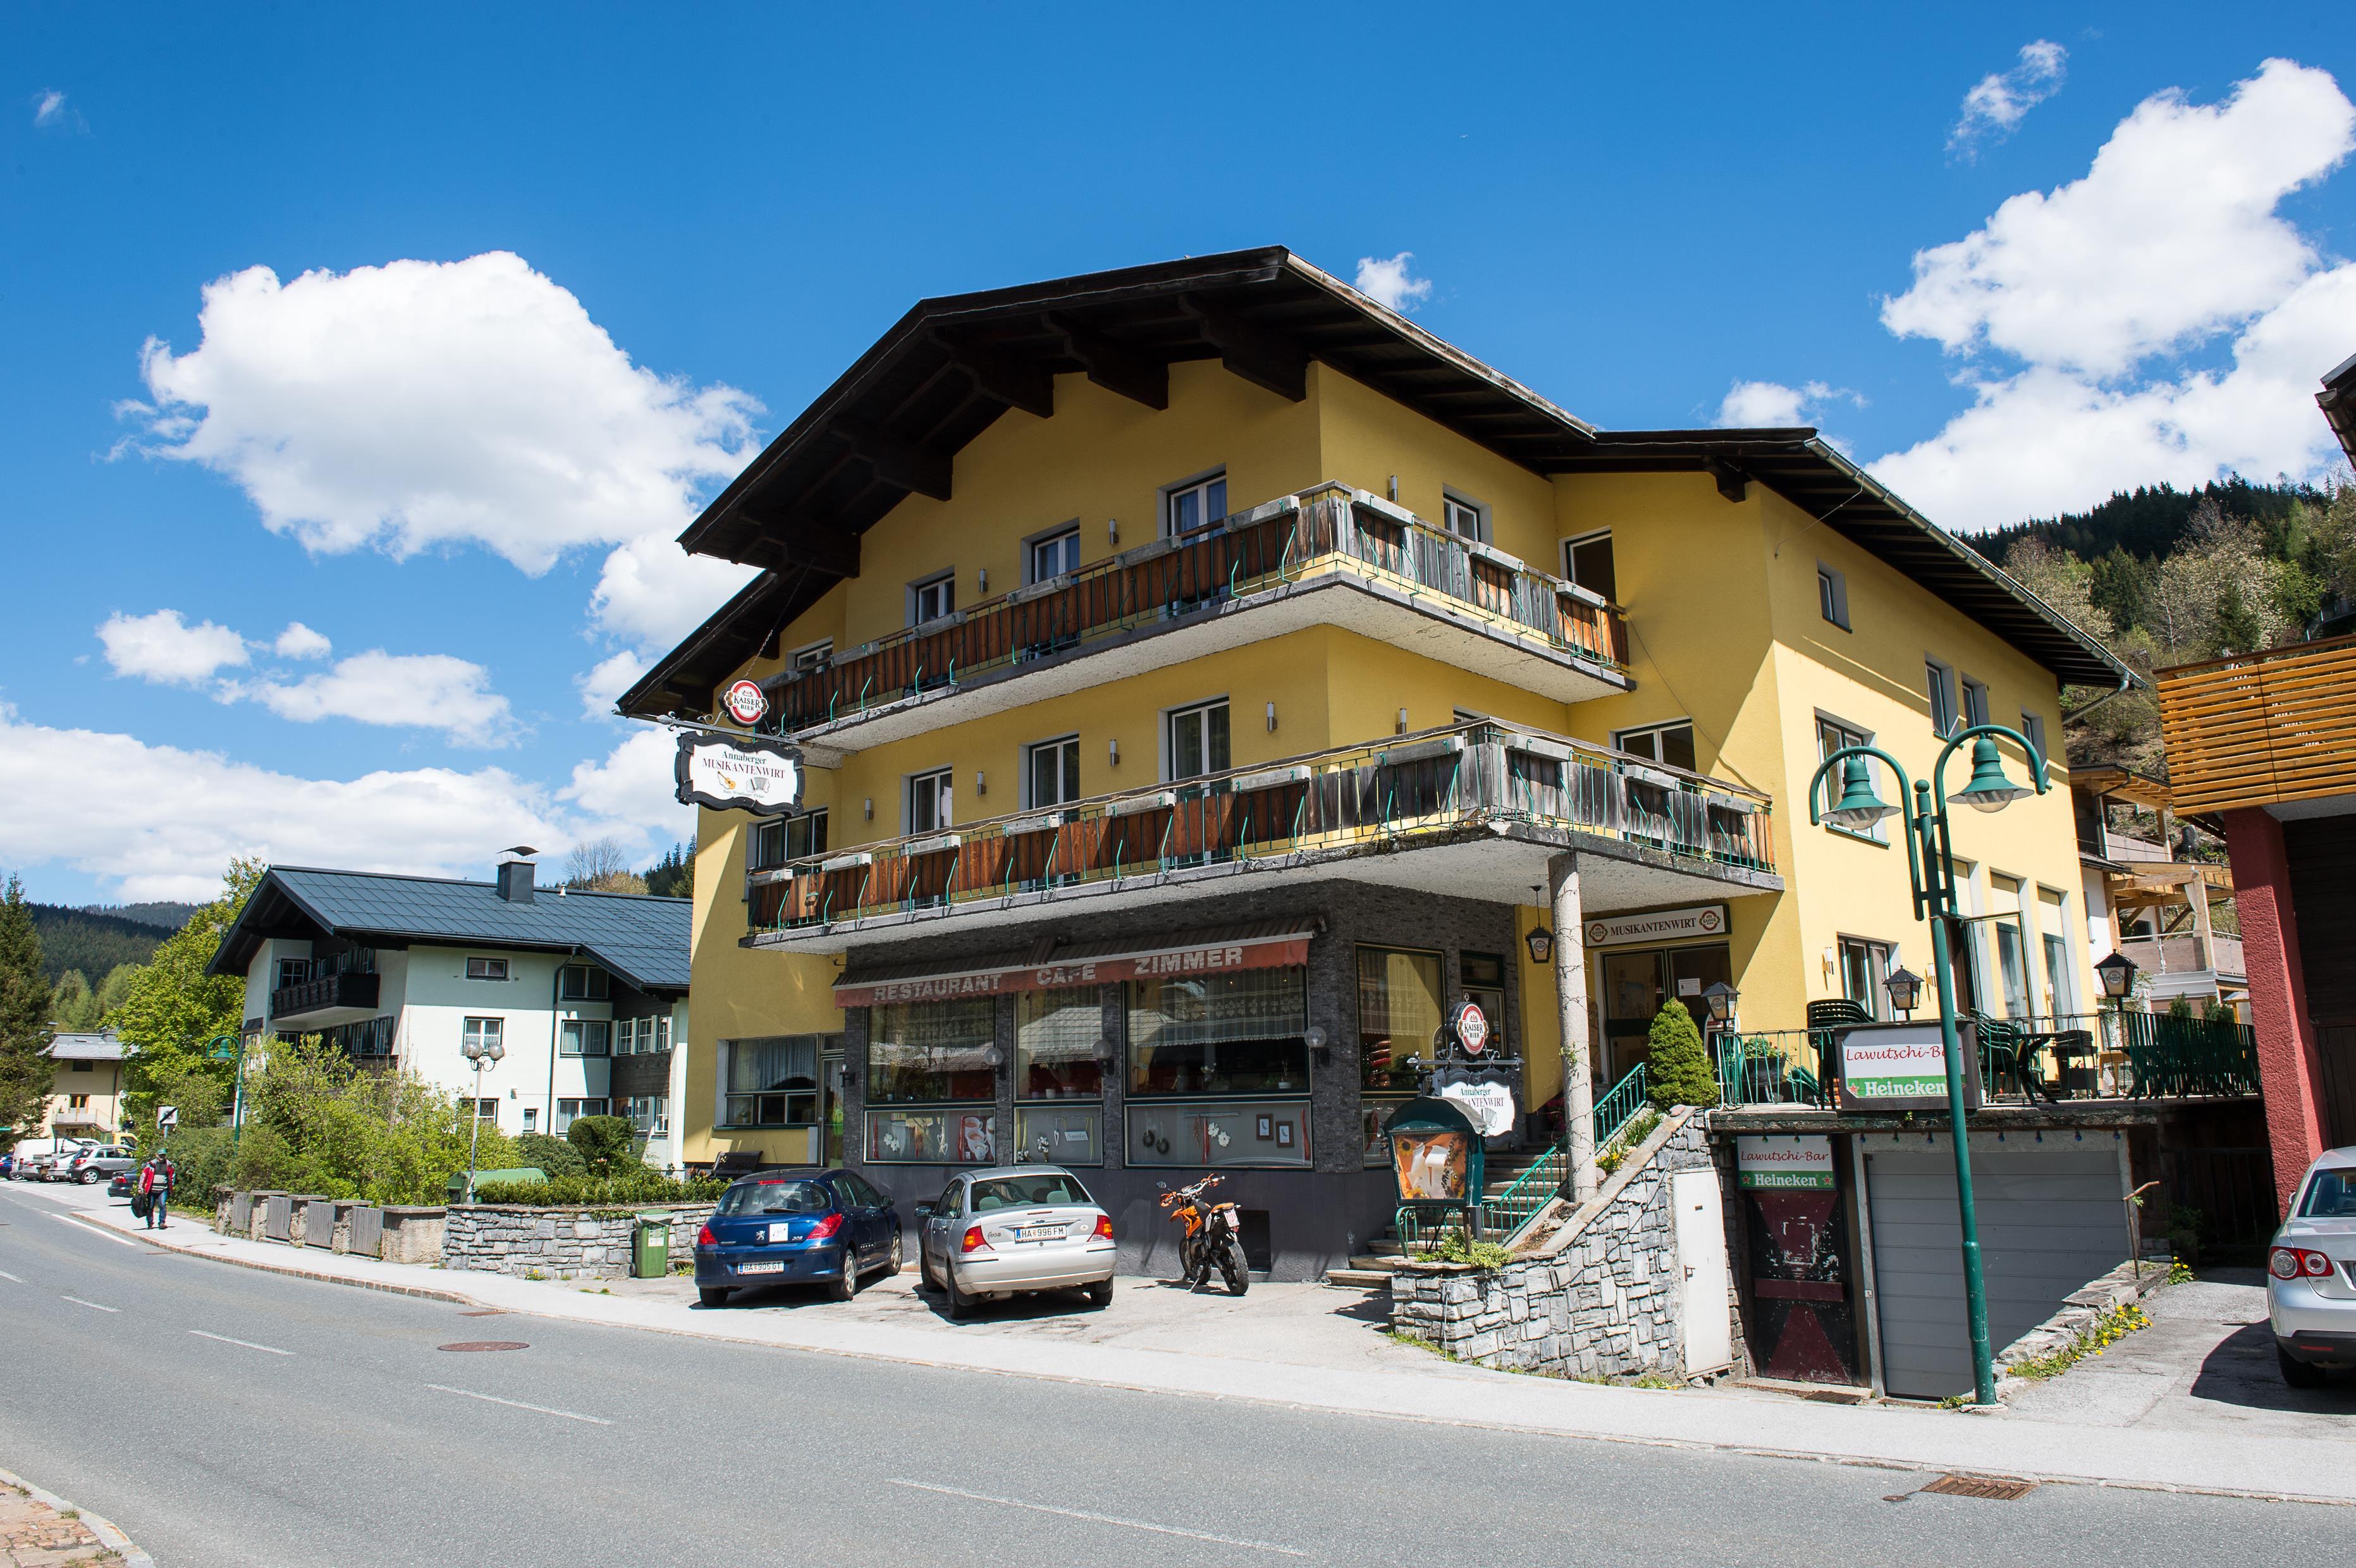 Gasthof Musikantenwirt - 5denný zimný pobyt so skipasom v cene**